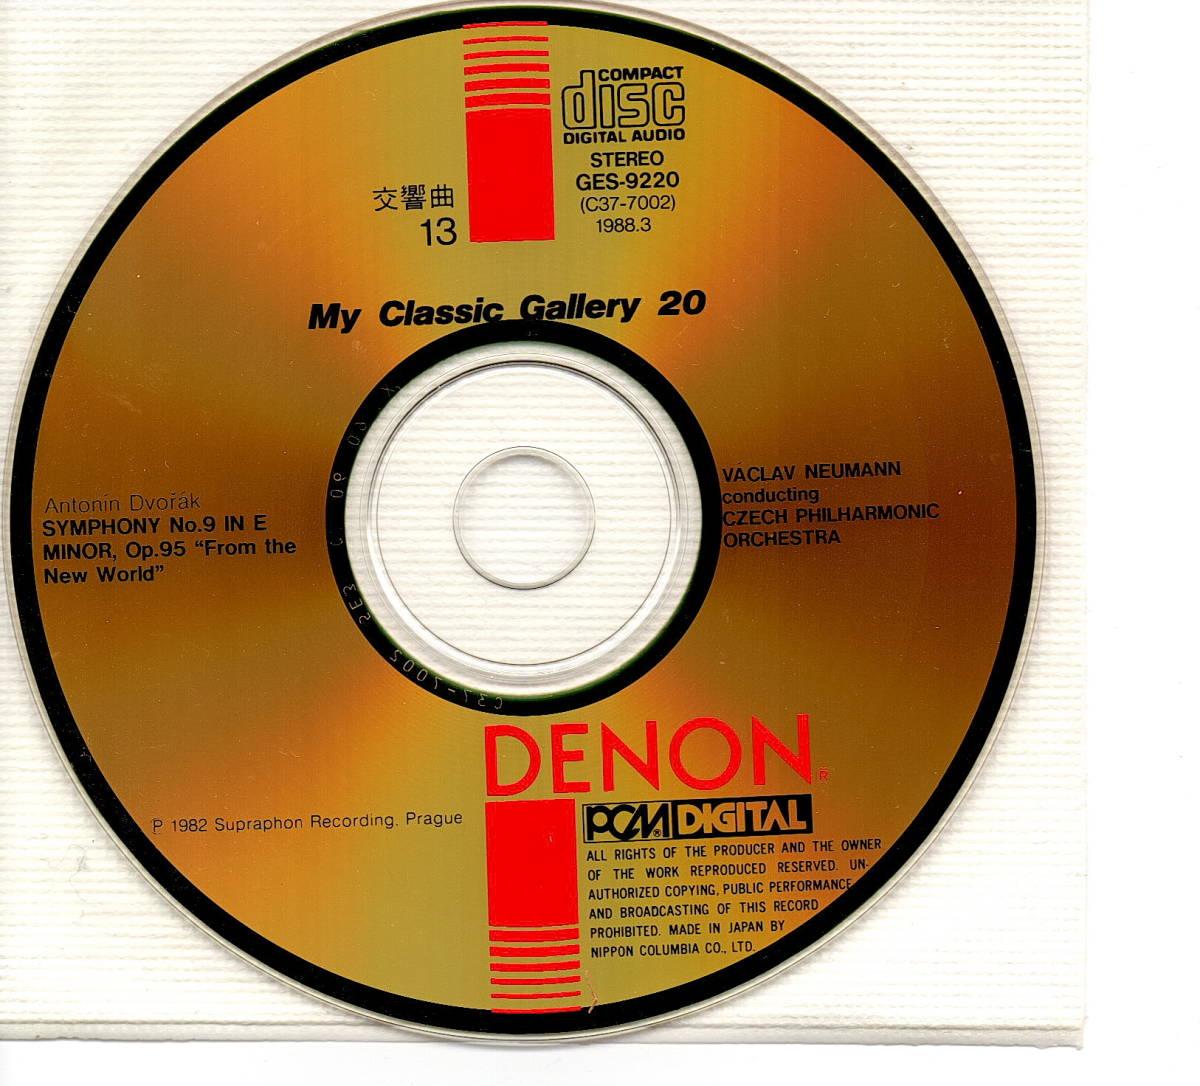 Pure Gold(金蒸着) CD! 高音質!:マーラー交響曲1番《巨人》 インバル指揮フランクフルト放響 屈指の名演奏